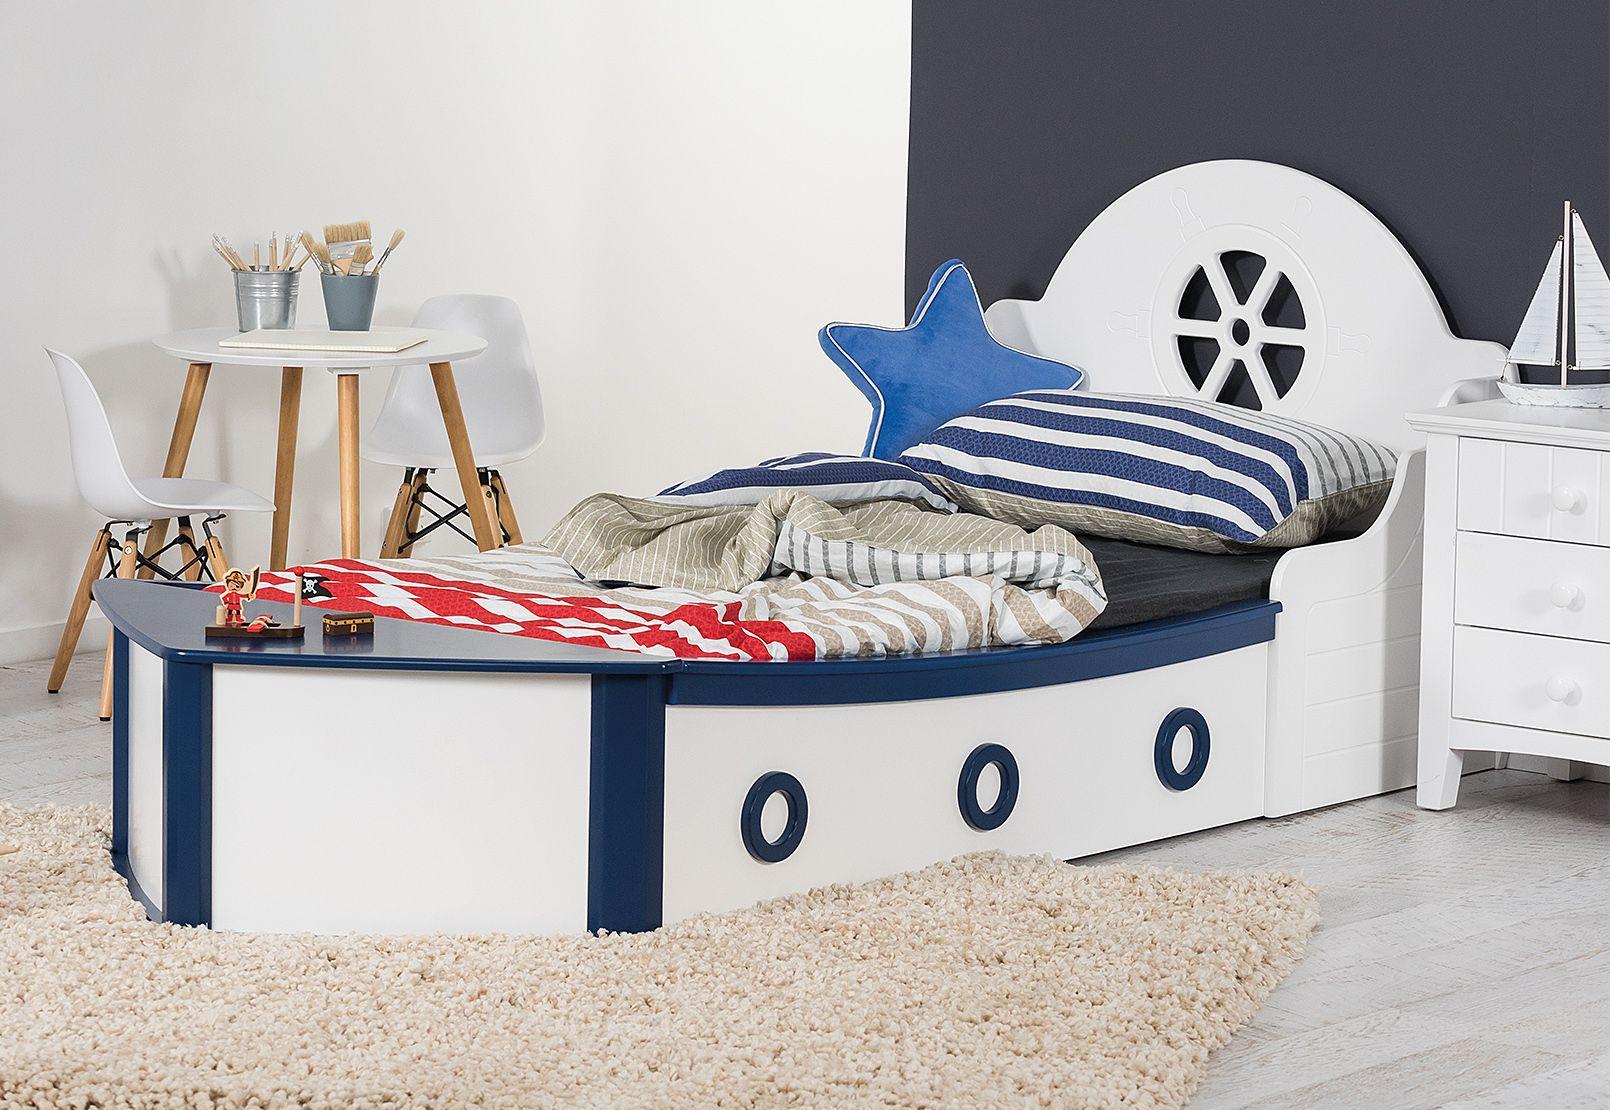 Minnow Single Boat Bed Amart Furniture Bed Bedroom Decor